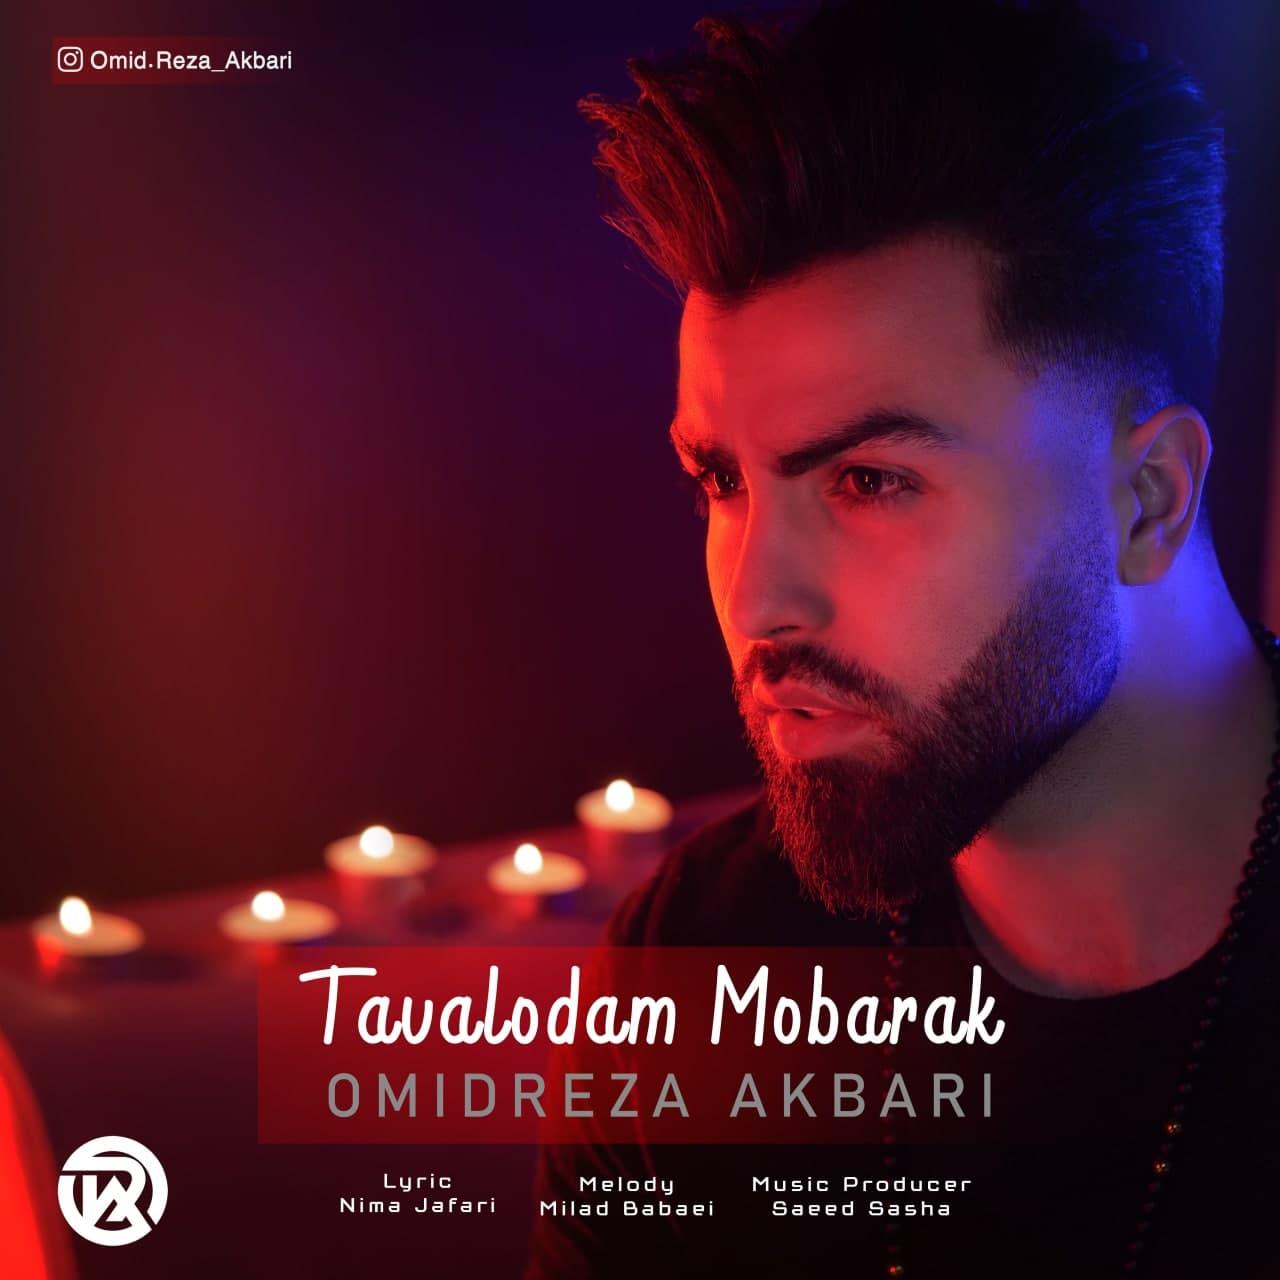 Omidreza Akbari – Tavalodam Mobarak